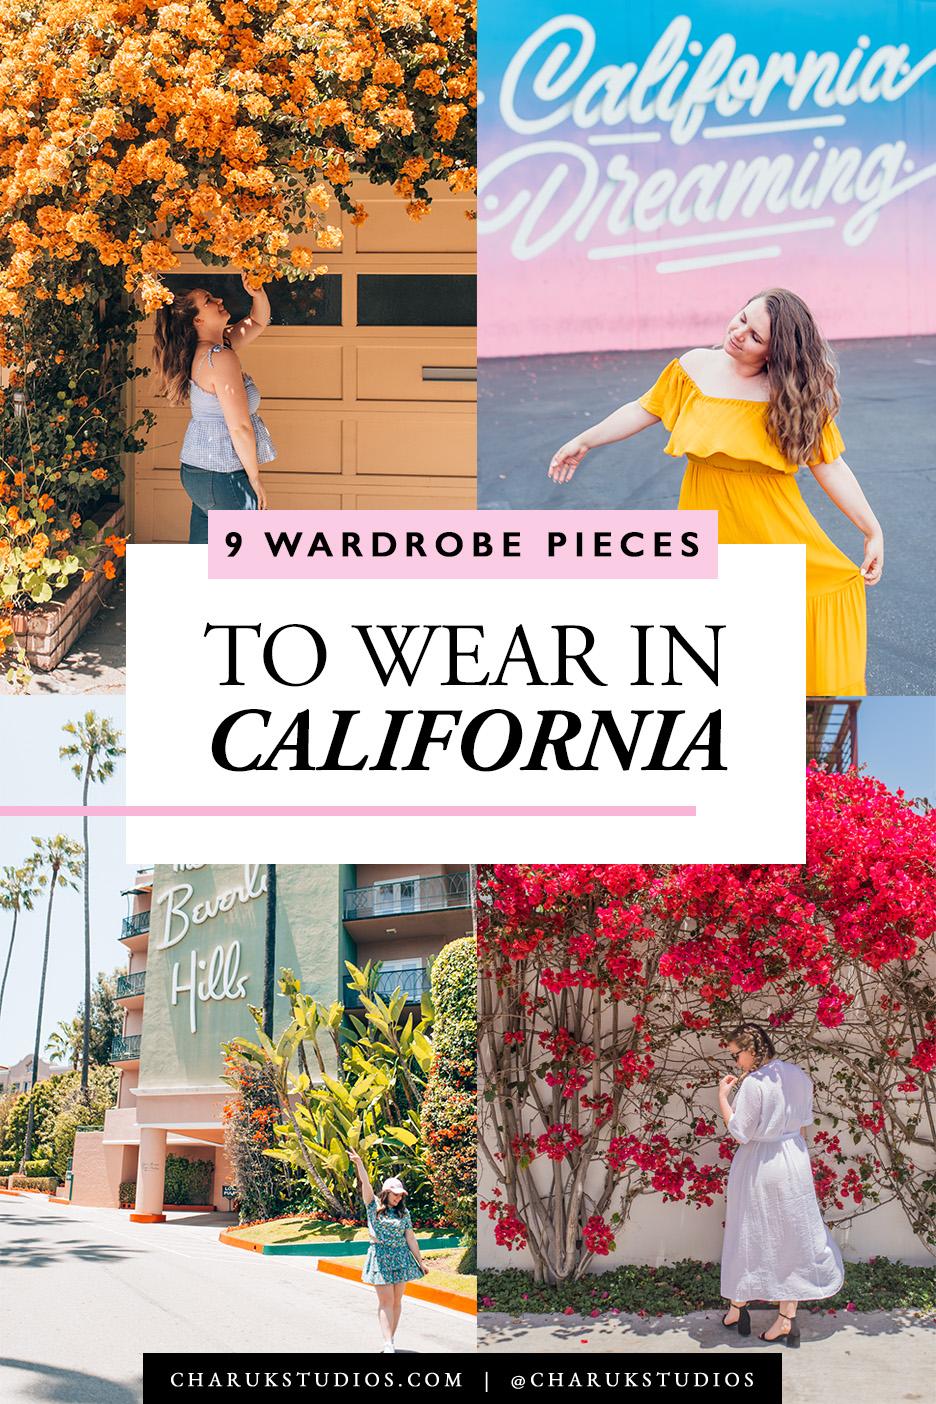 9 Wardrobe Pieces to Wear in California by Charuk Studios